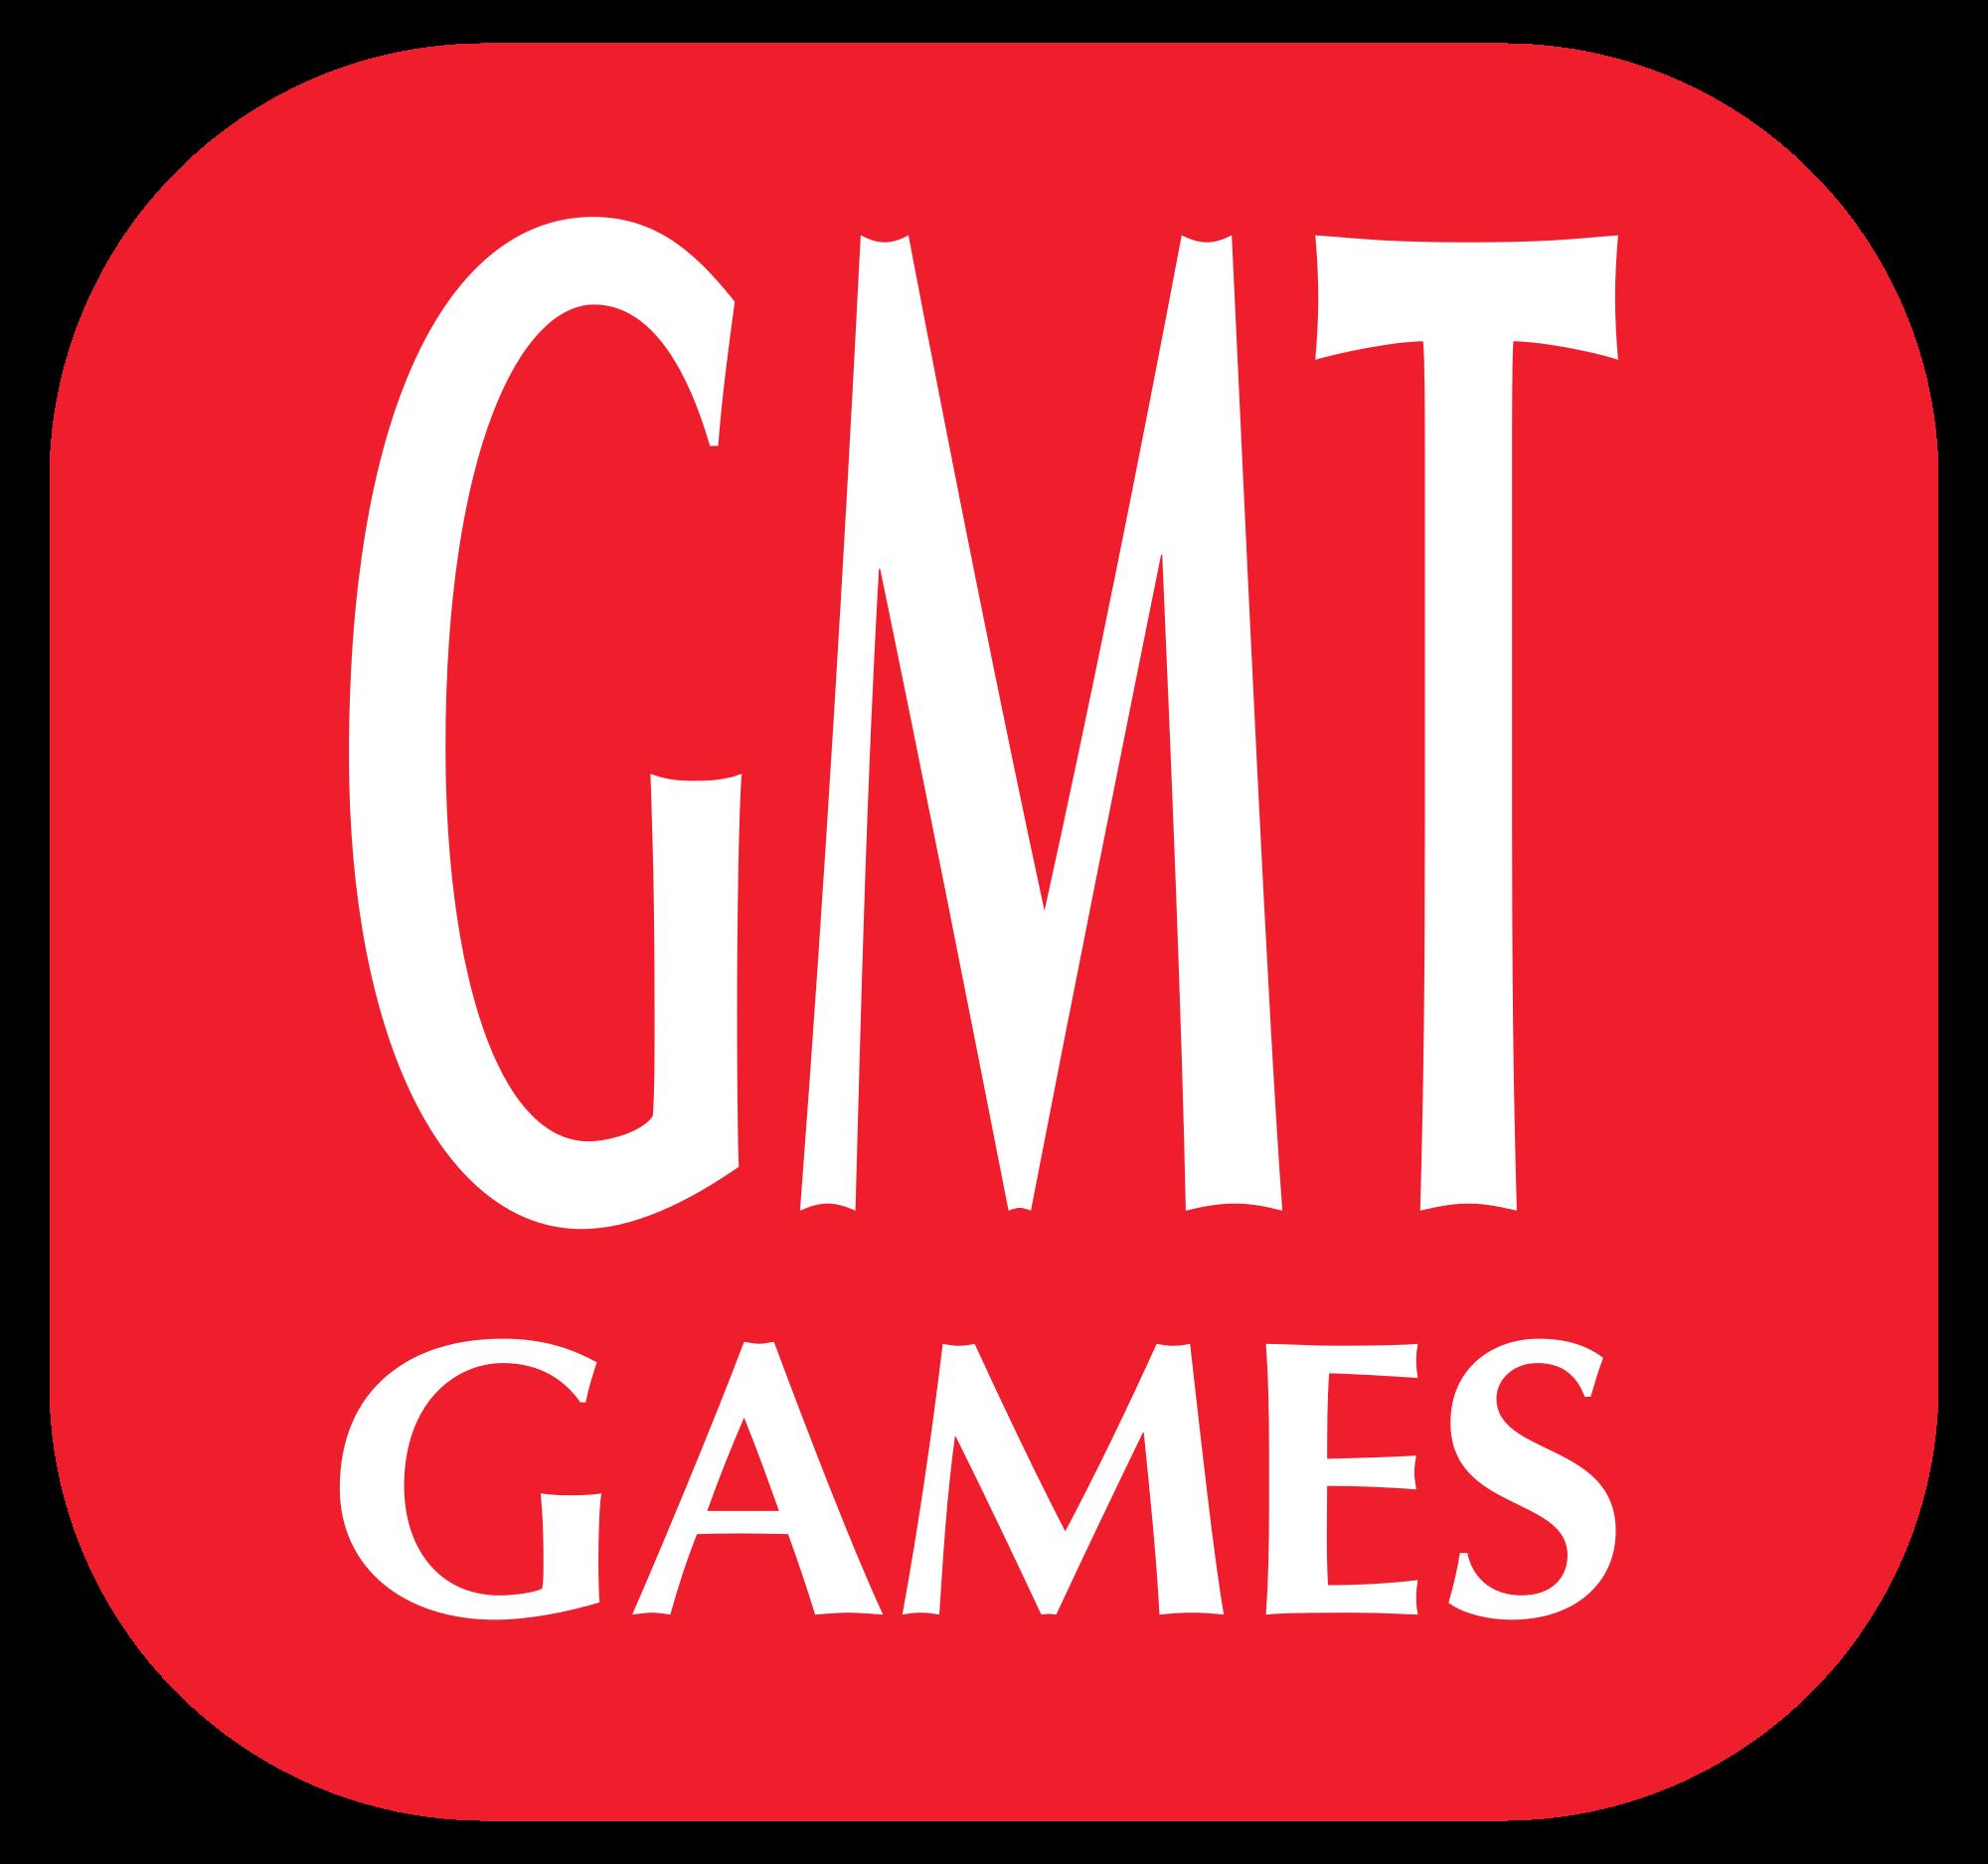 GMT games logo